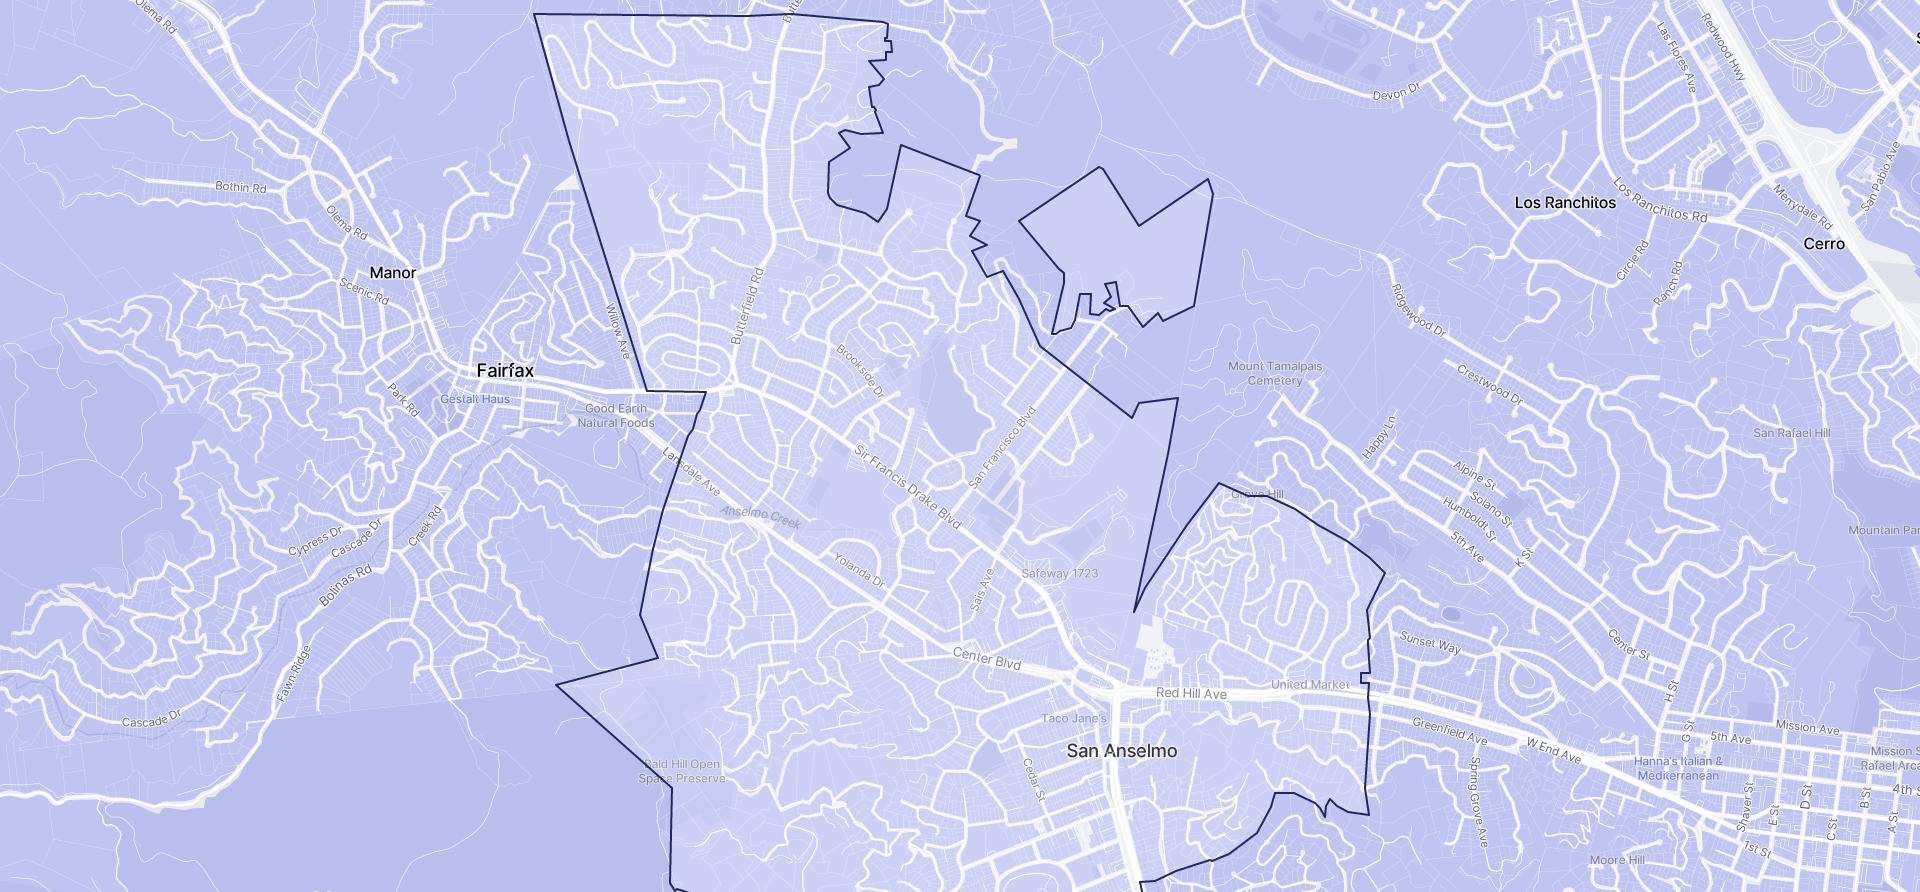 Image of San Anselmo boundaries on a map.